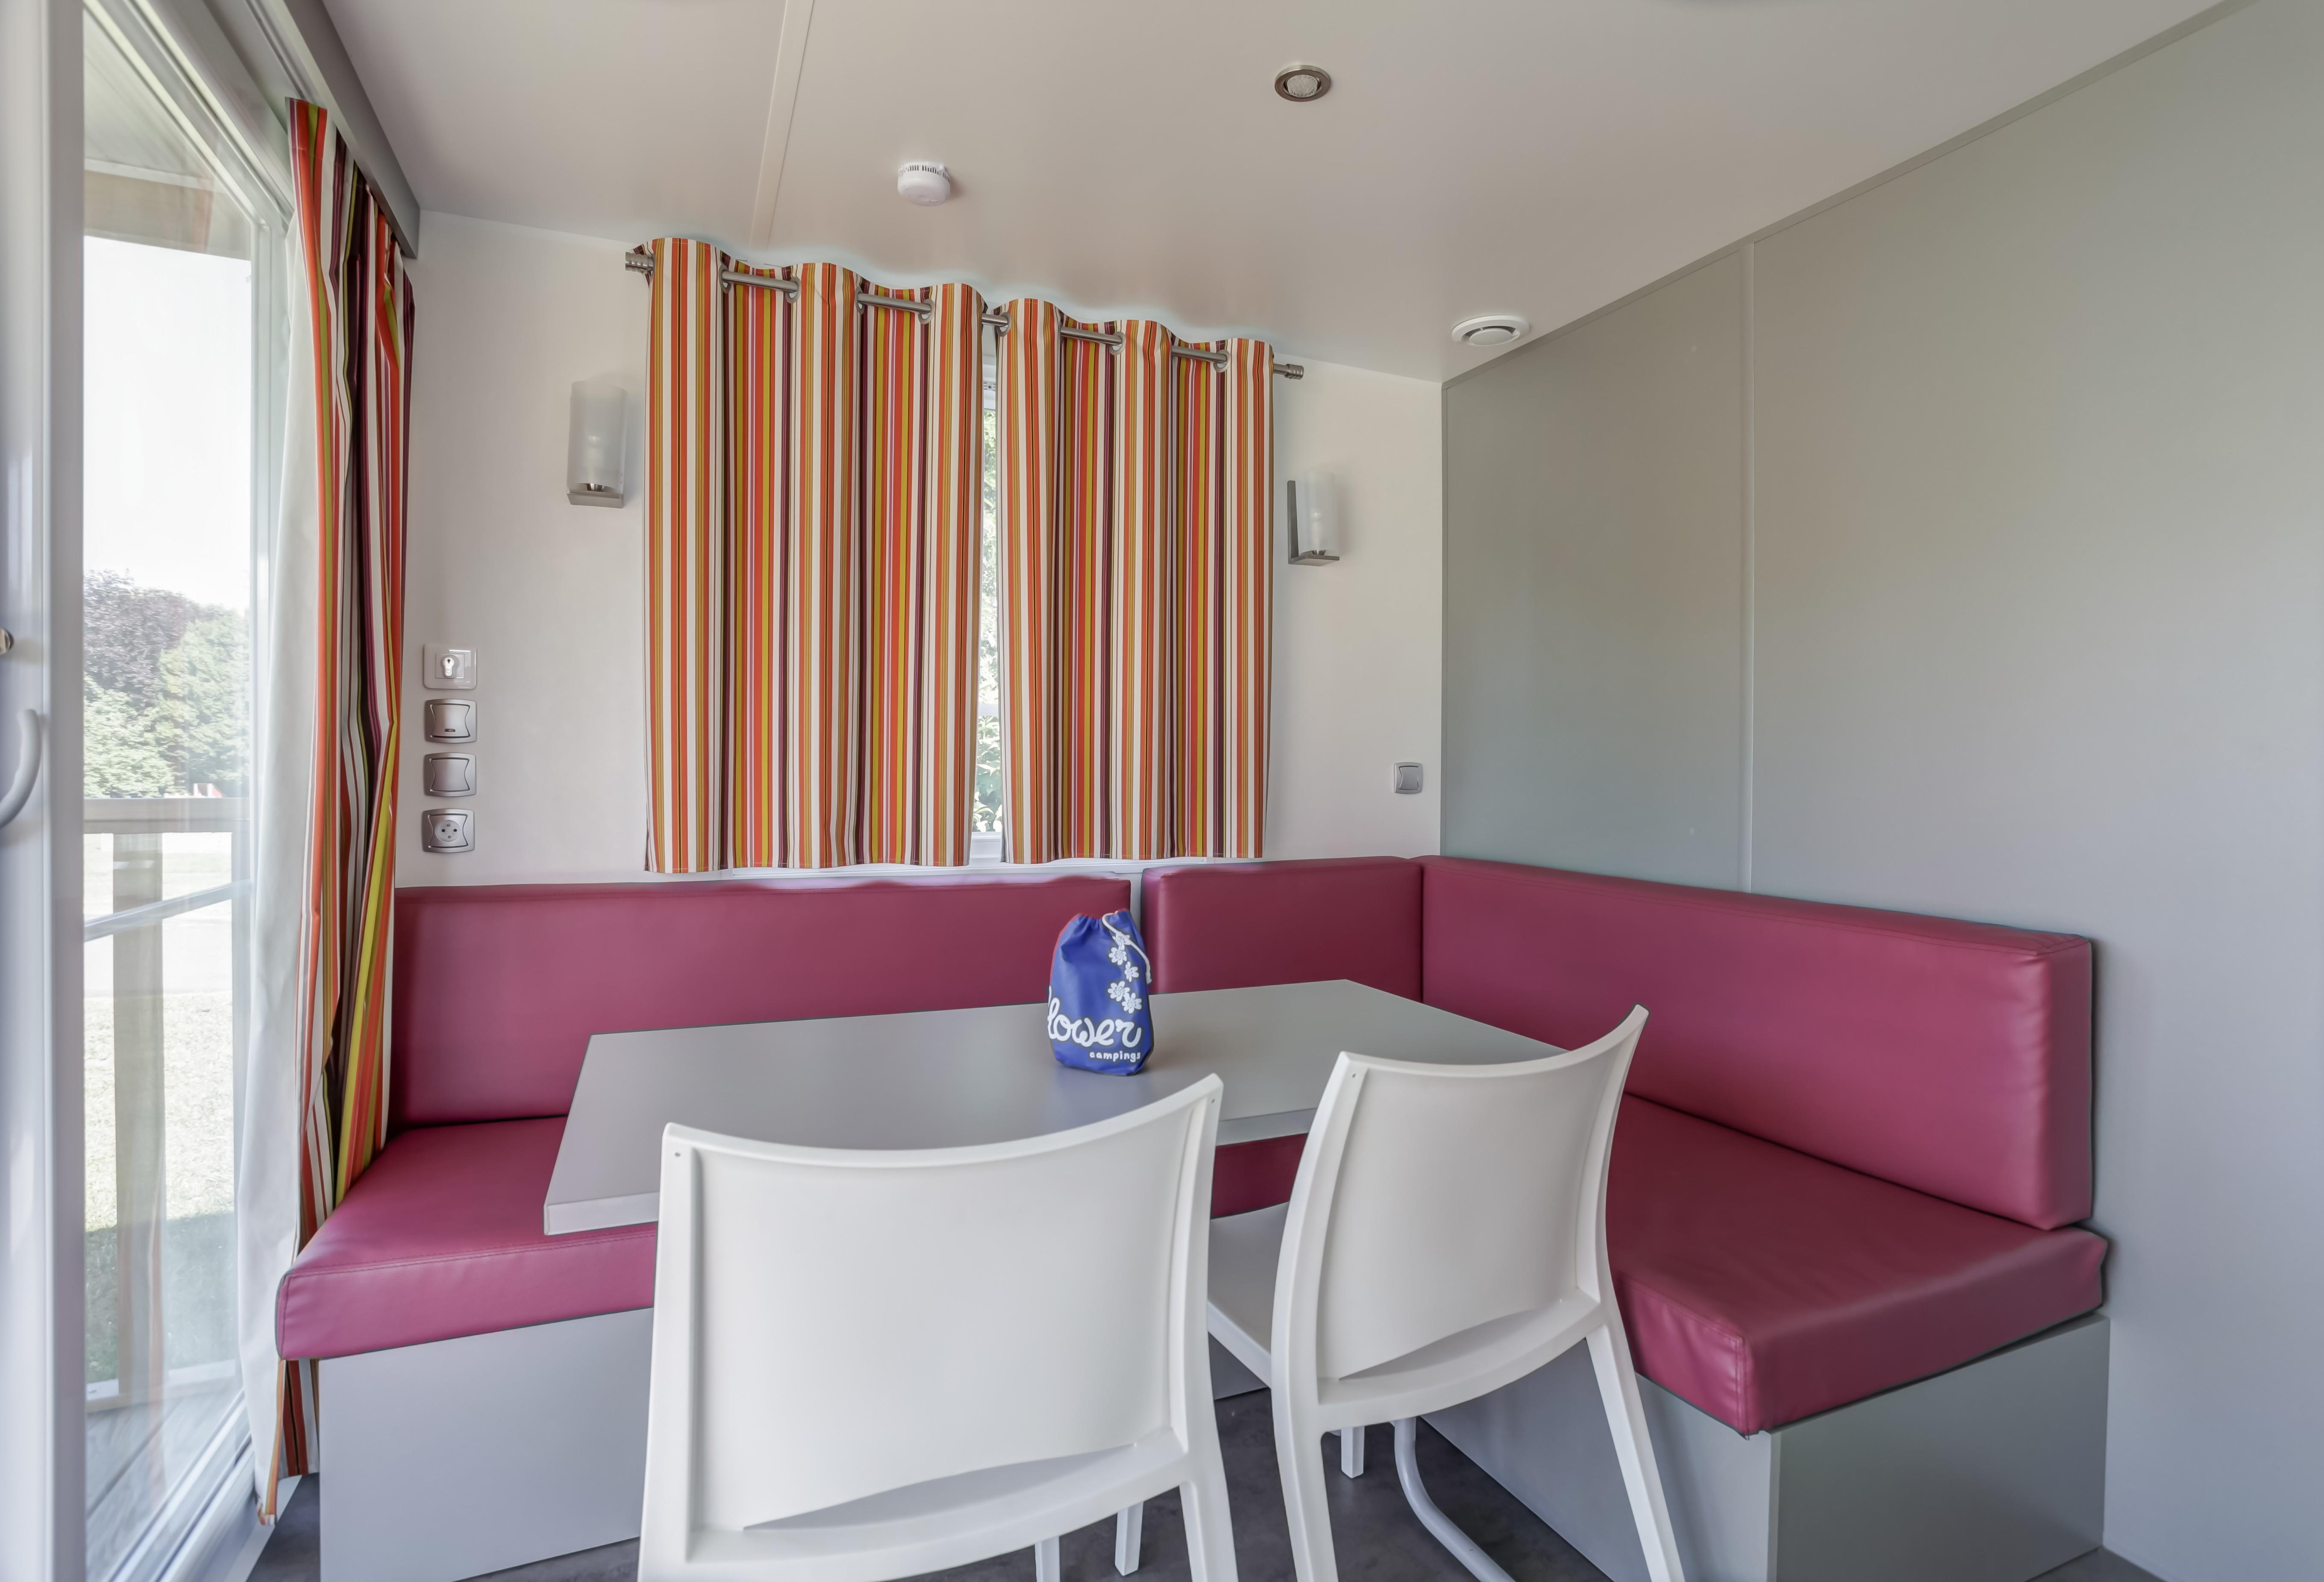 Mobil home Confort+ 26m² 2 chambres + terrasse couverte 7m² + bord de Loire + TV